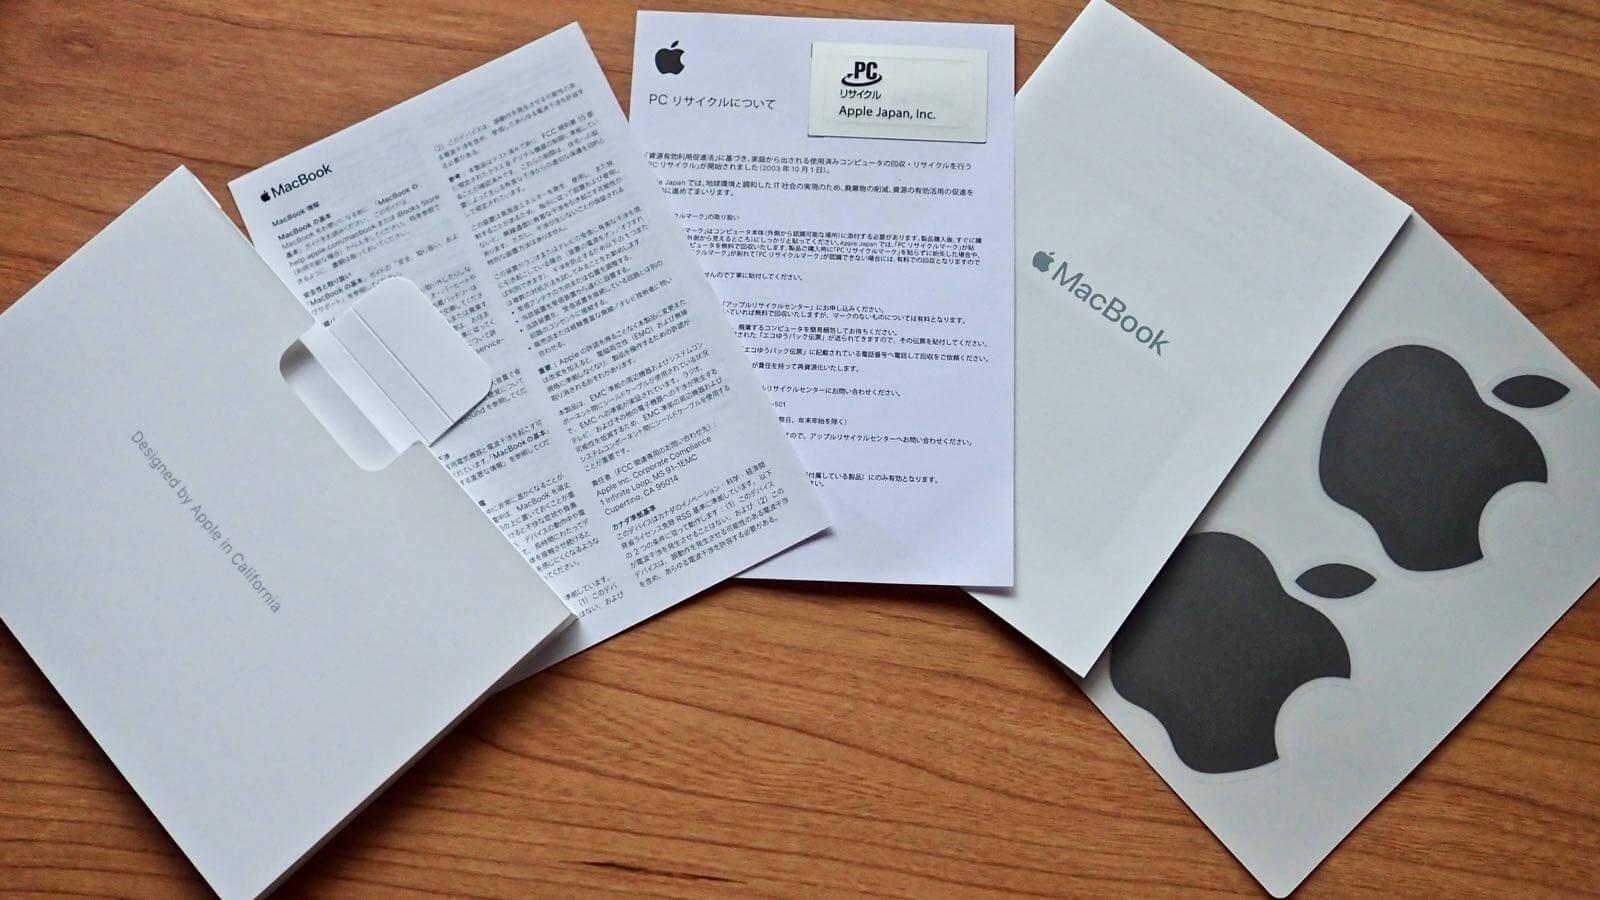 0202 Apple maintenance item Quality MacBook 2017 12inch 017